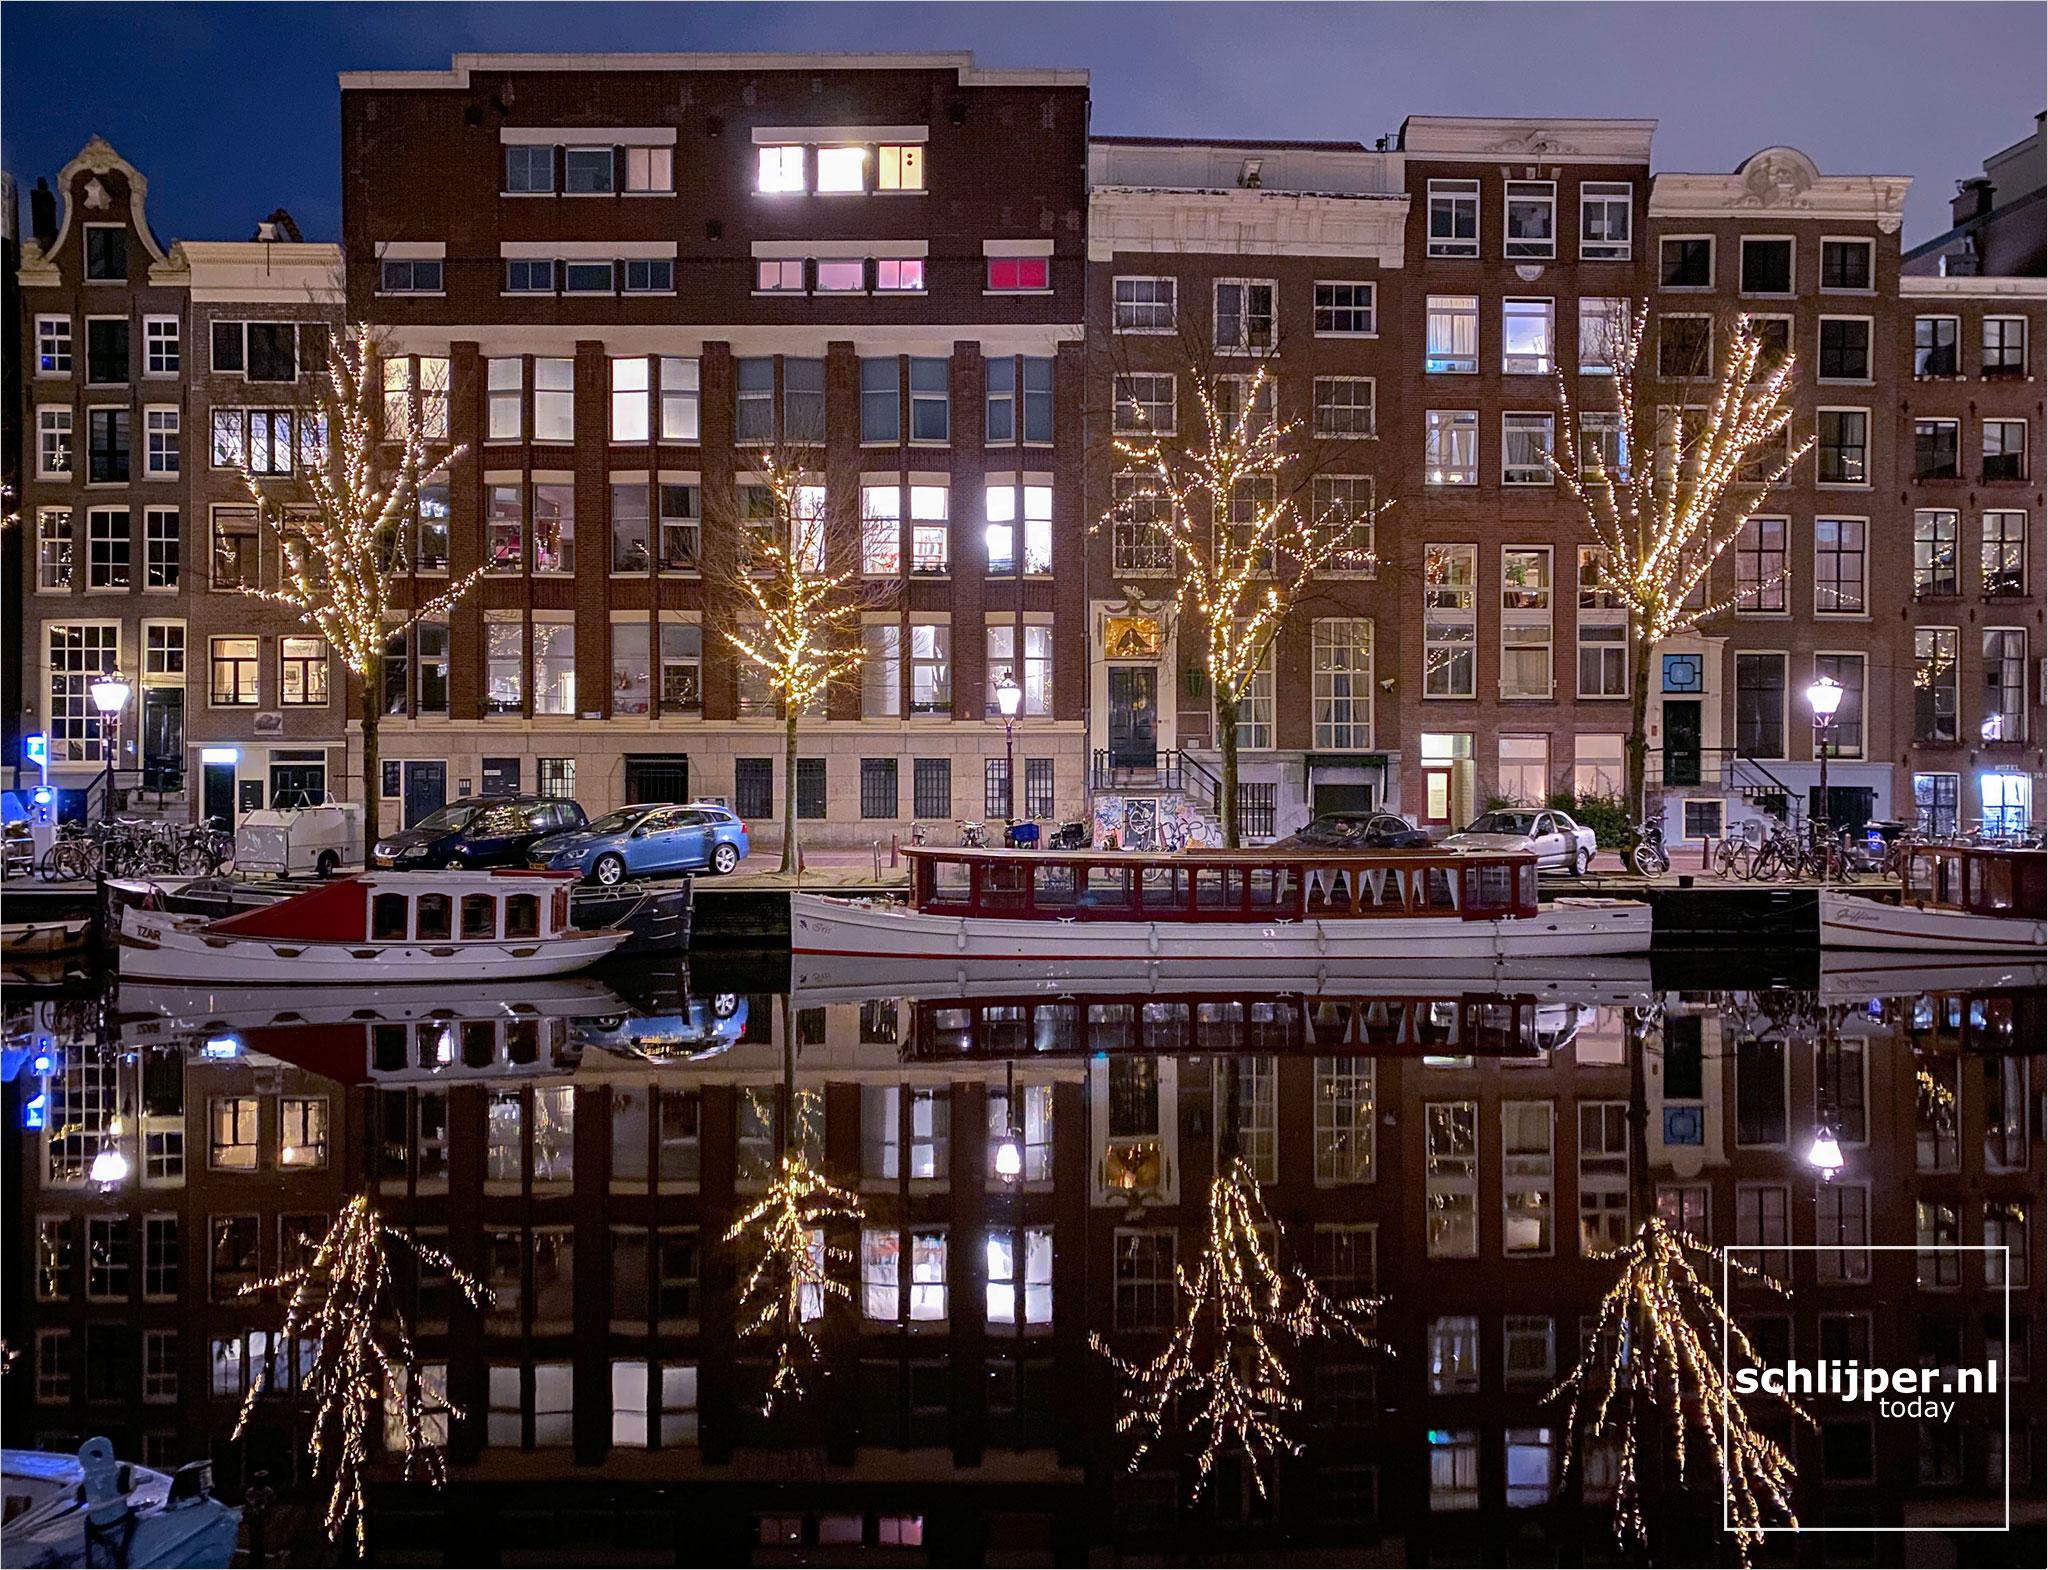 The Netherlands, Amsterdam, 23 januari 2021